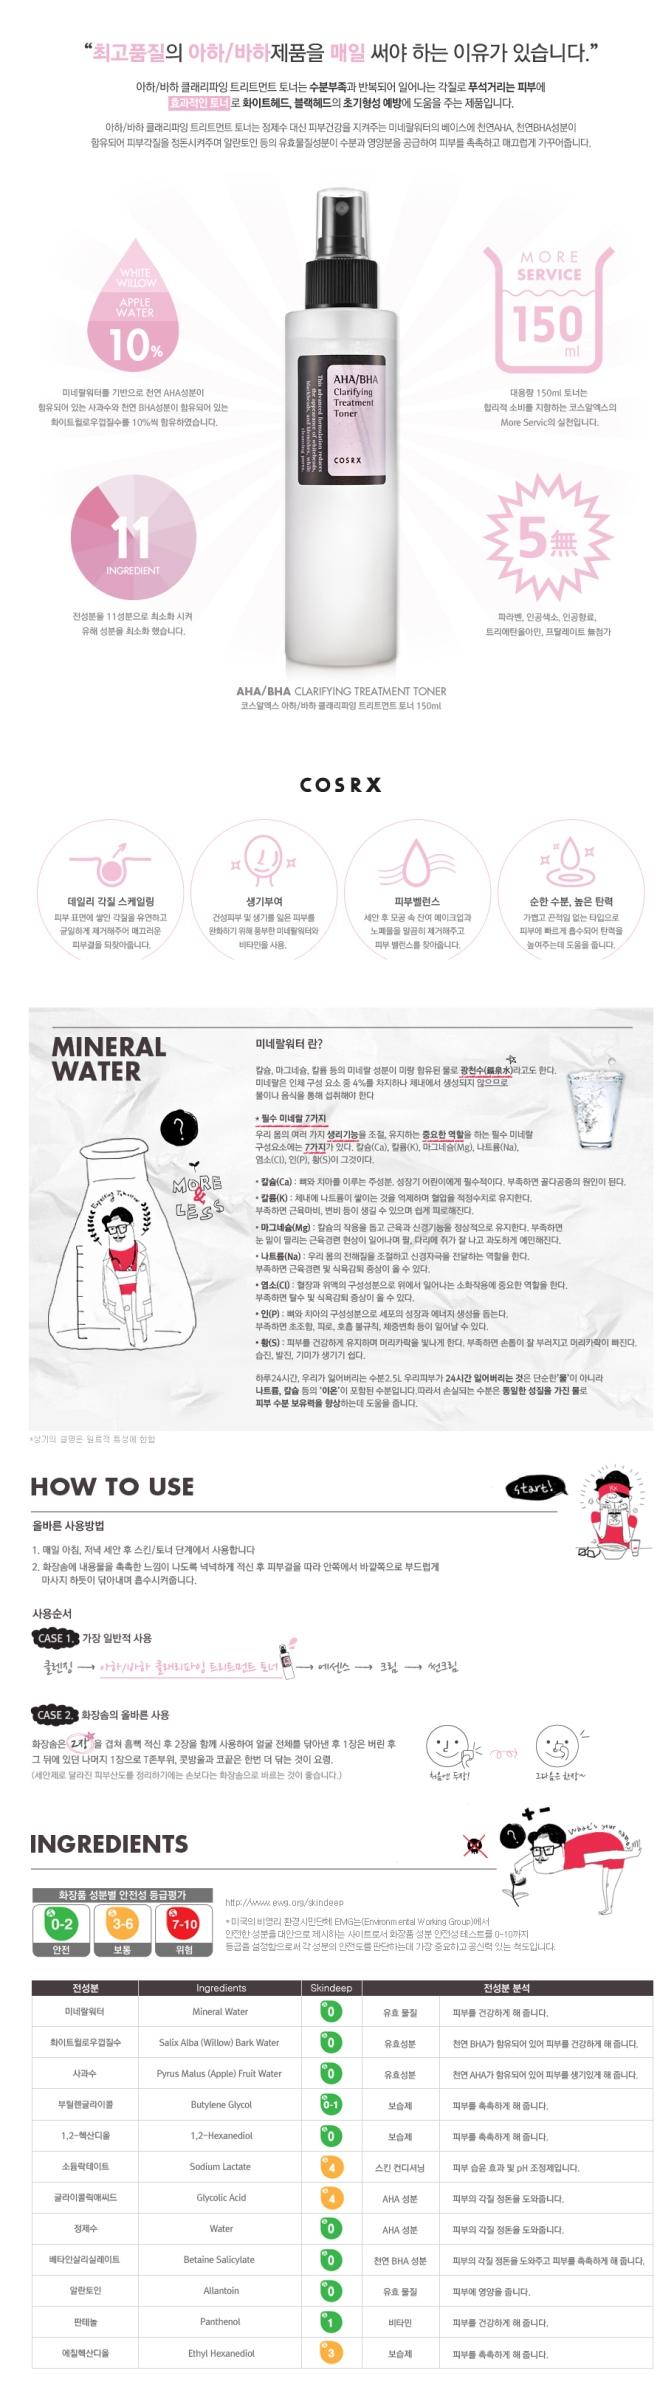 Credit: COSRX Korea website